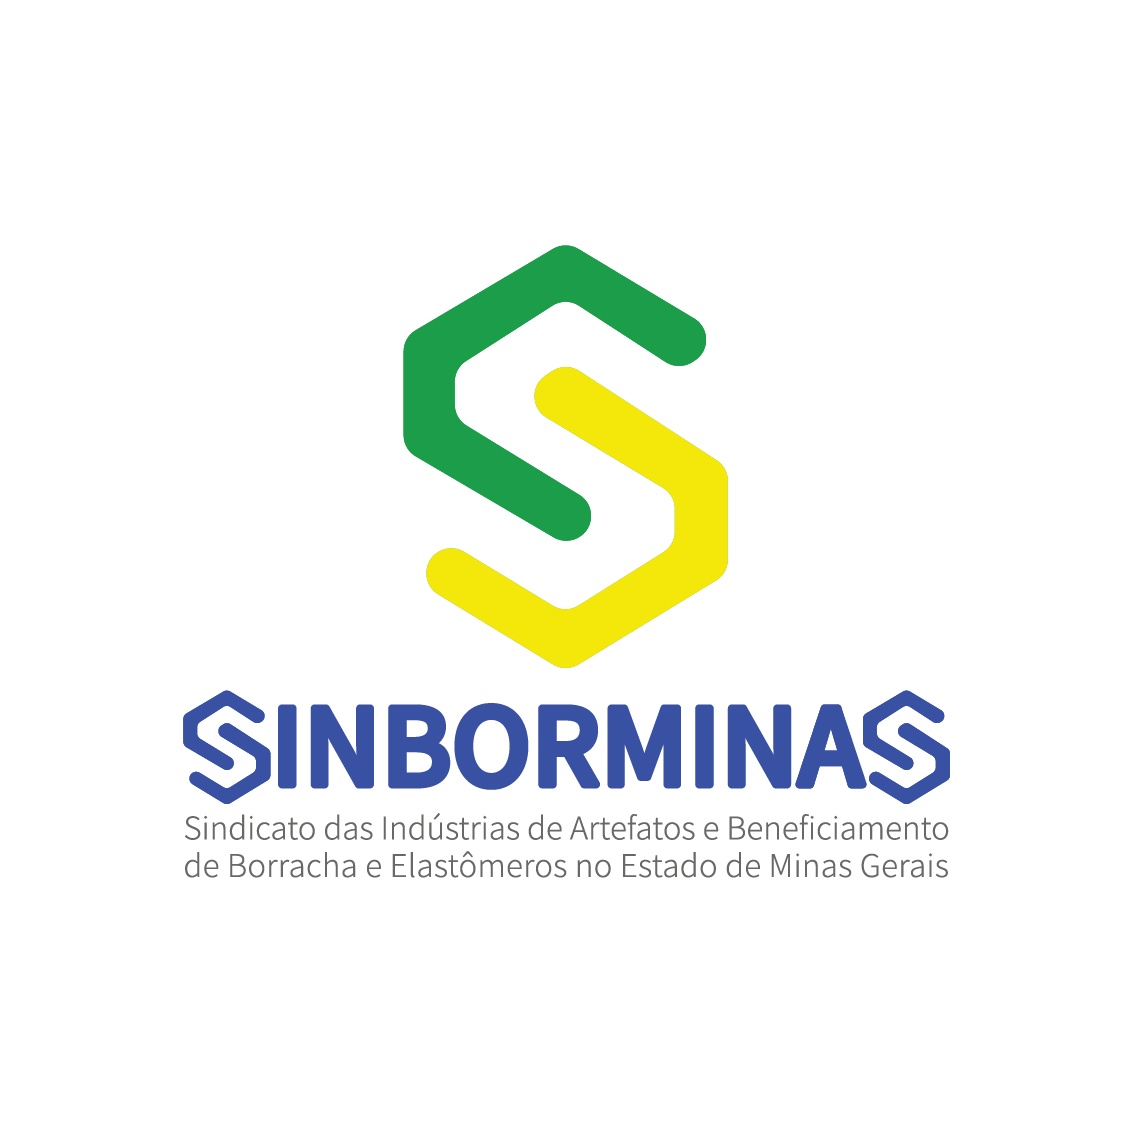 Sindicato das Indústrias de Artefatos e Beneficiamento  de Borracha e Elastômeros  no Estado de Minas Gerais